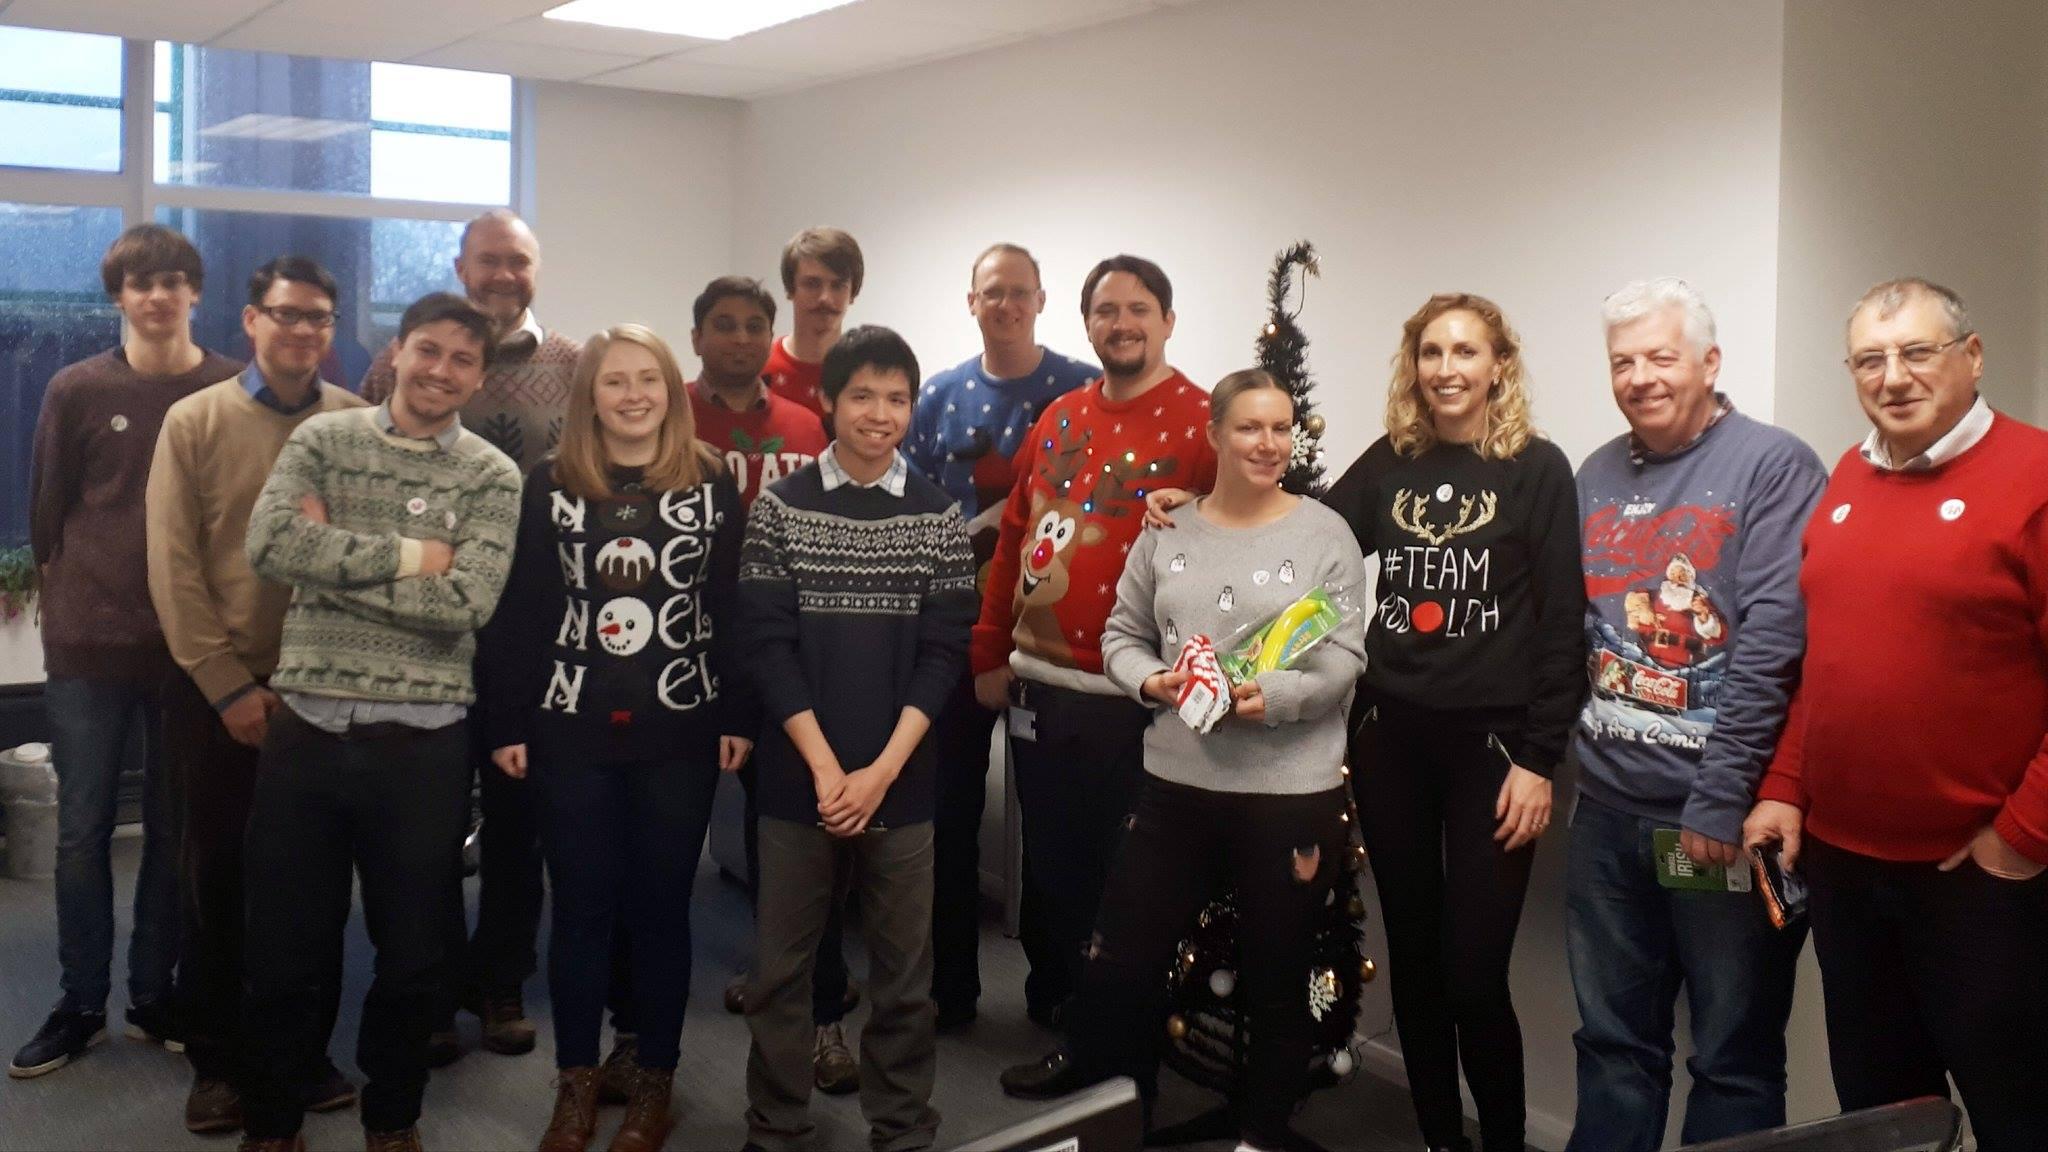 Christmas Jumper Day - Raising money for Save the Children